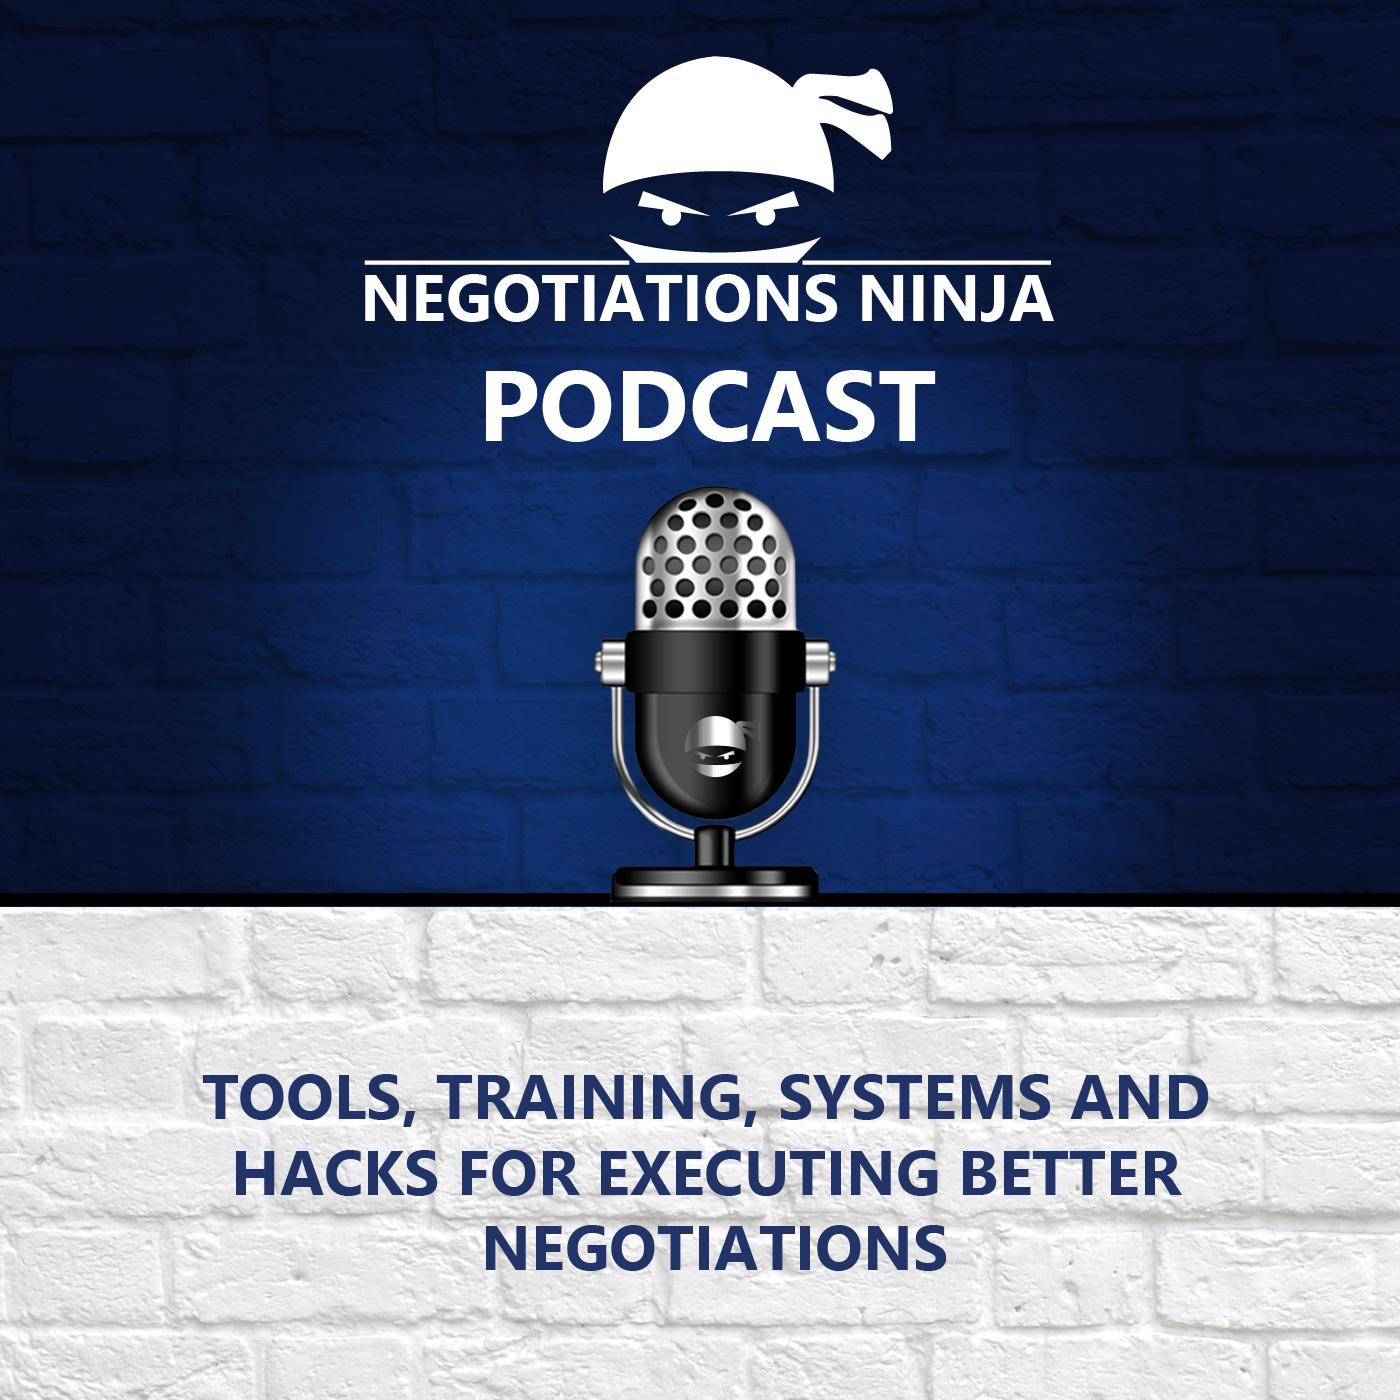 Navy Seal Negotiations